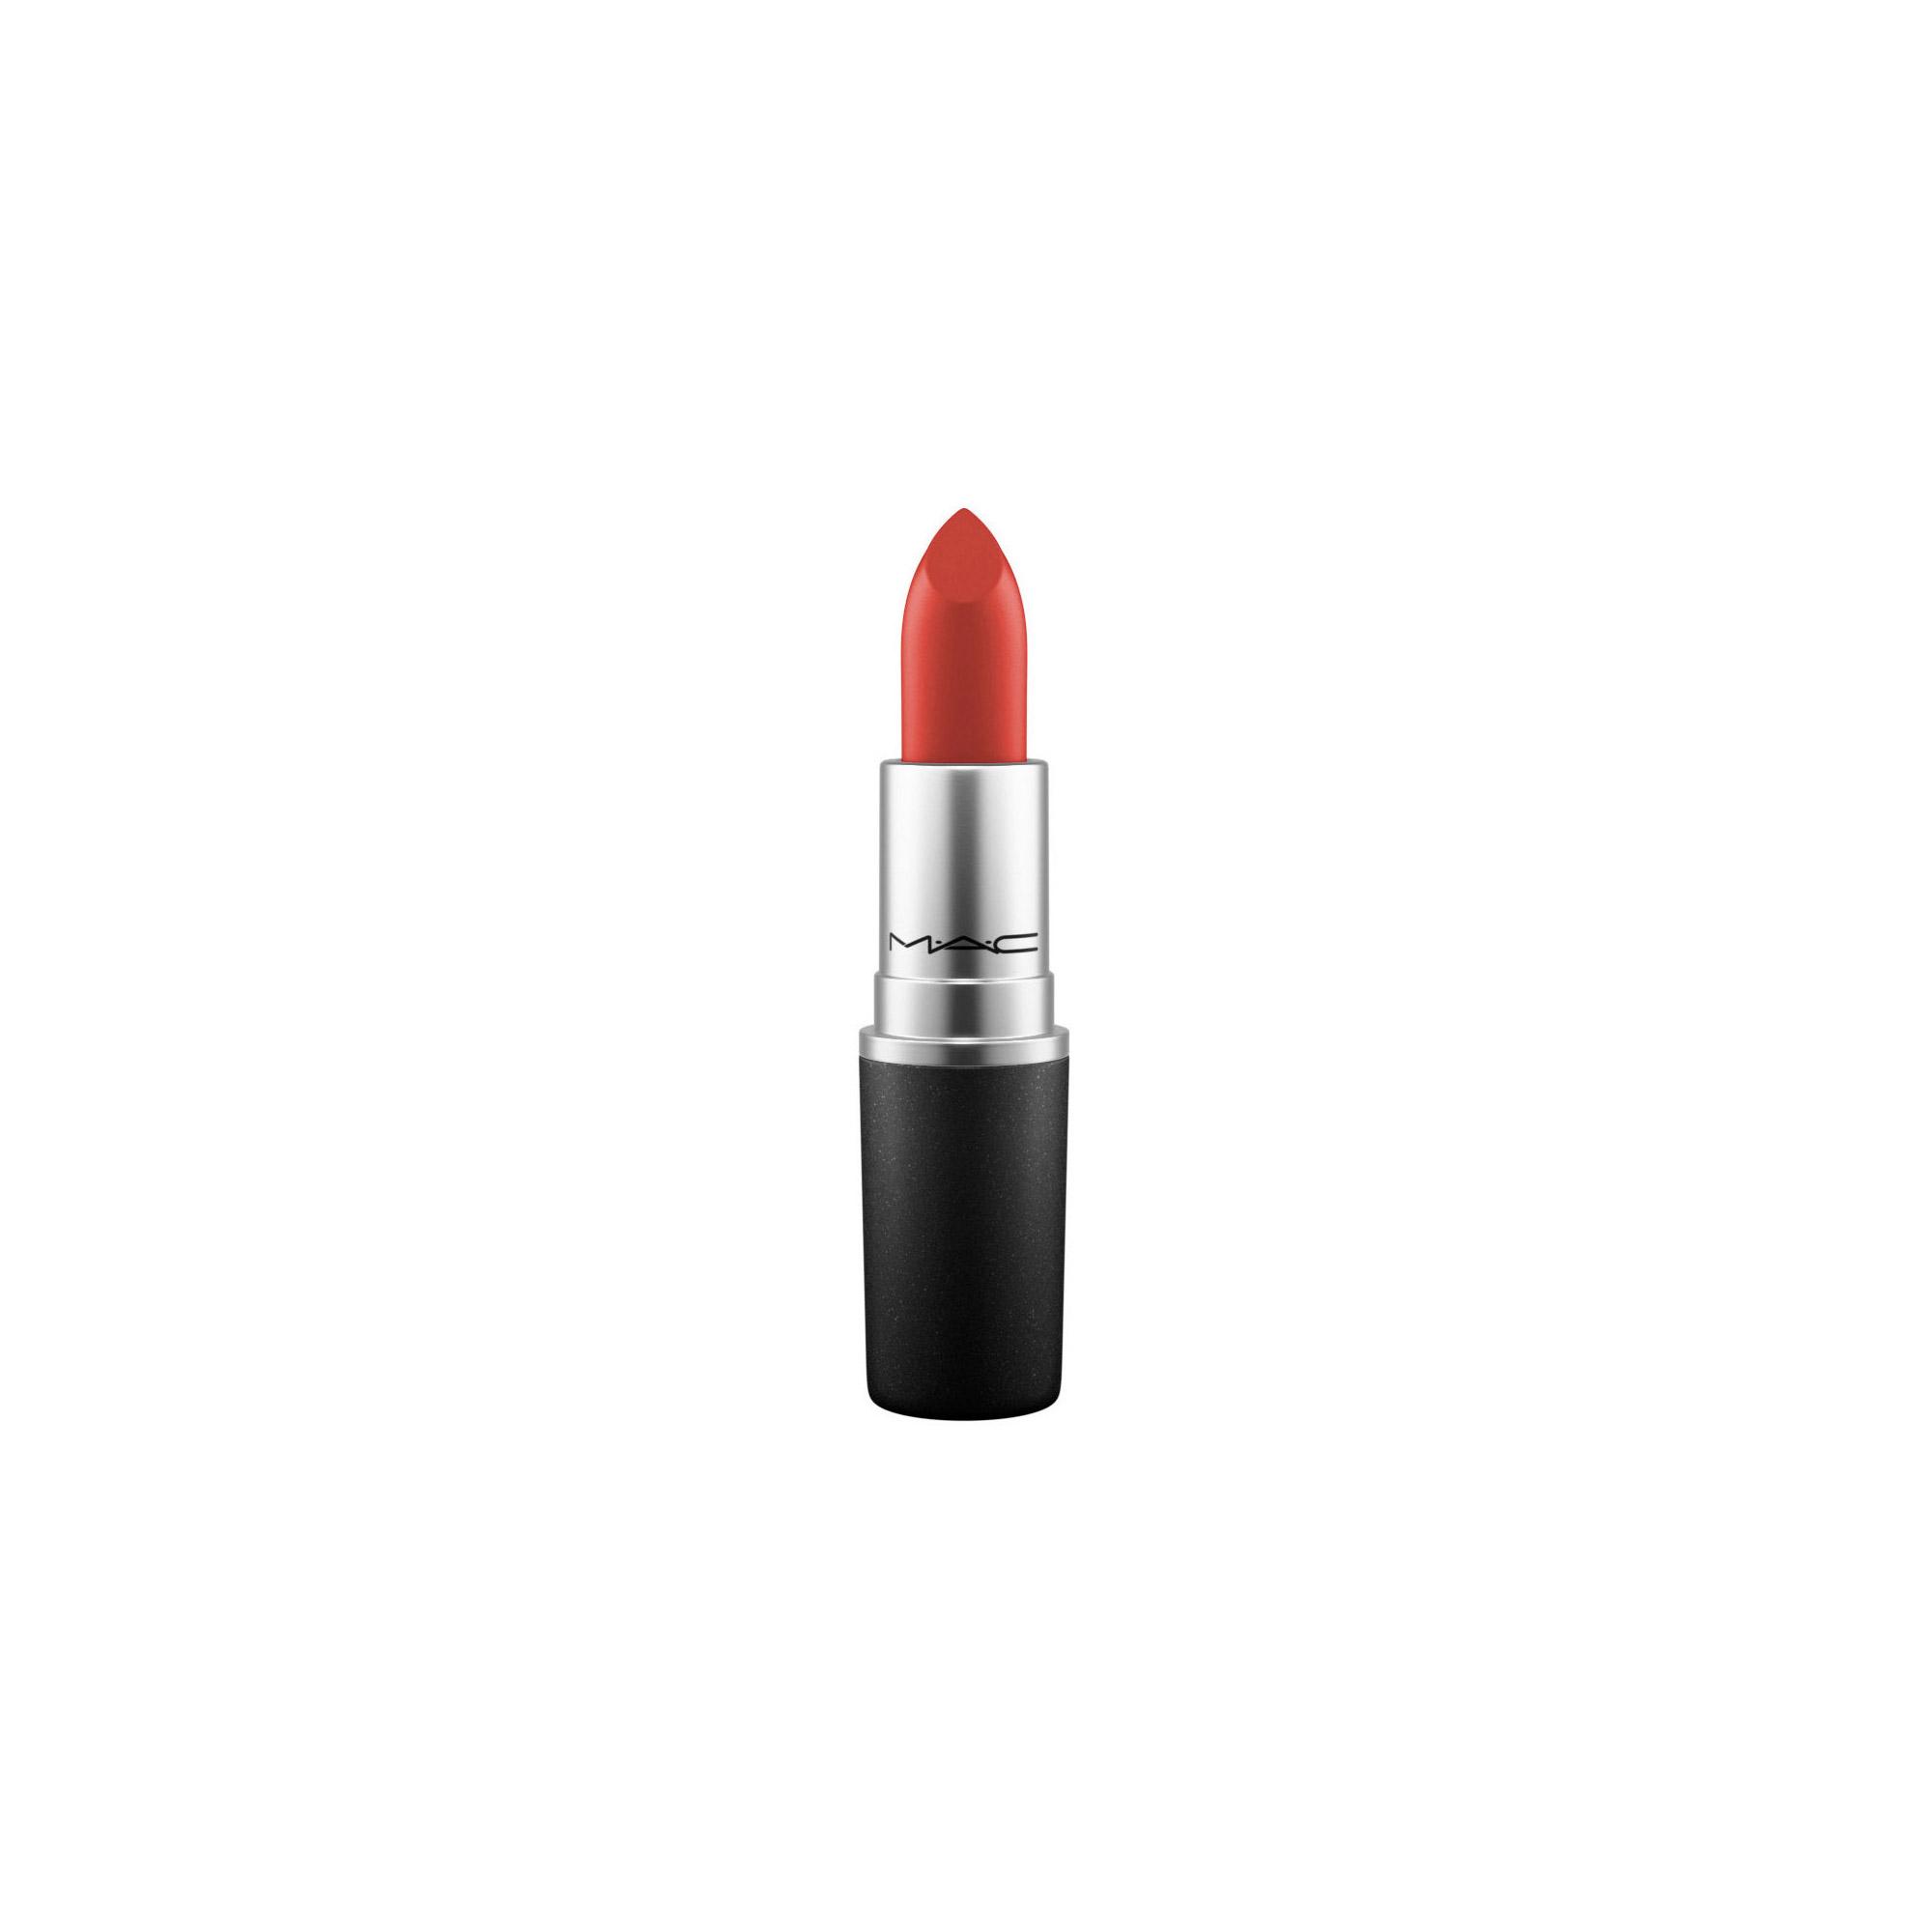 Lipstick Matte Chili